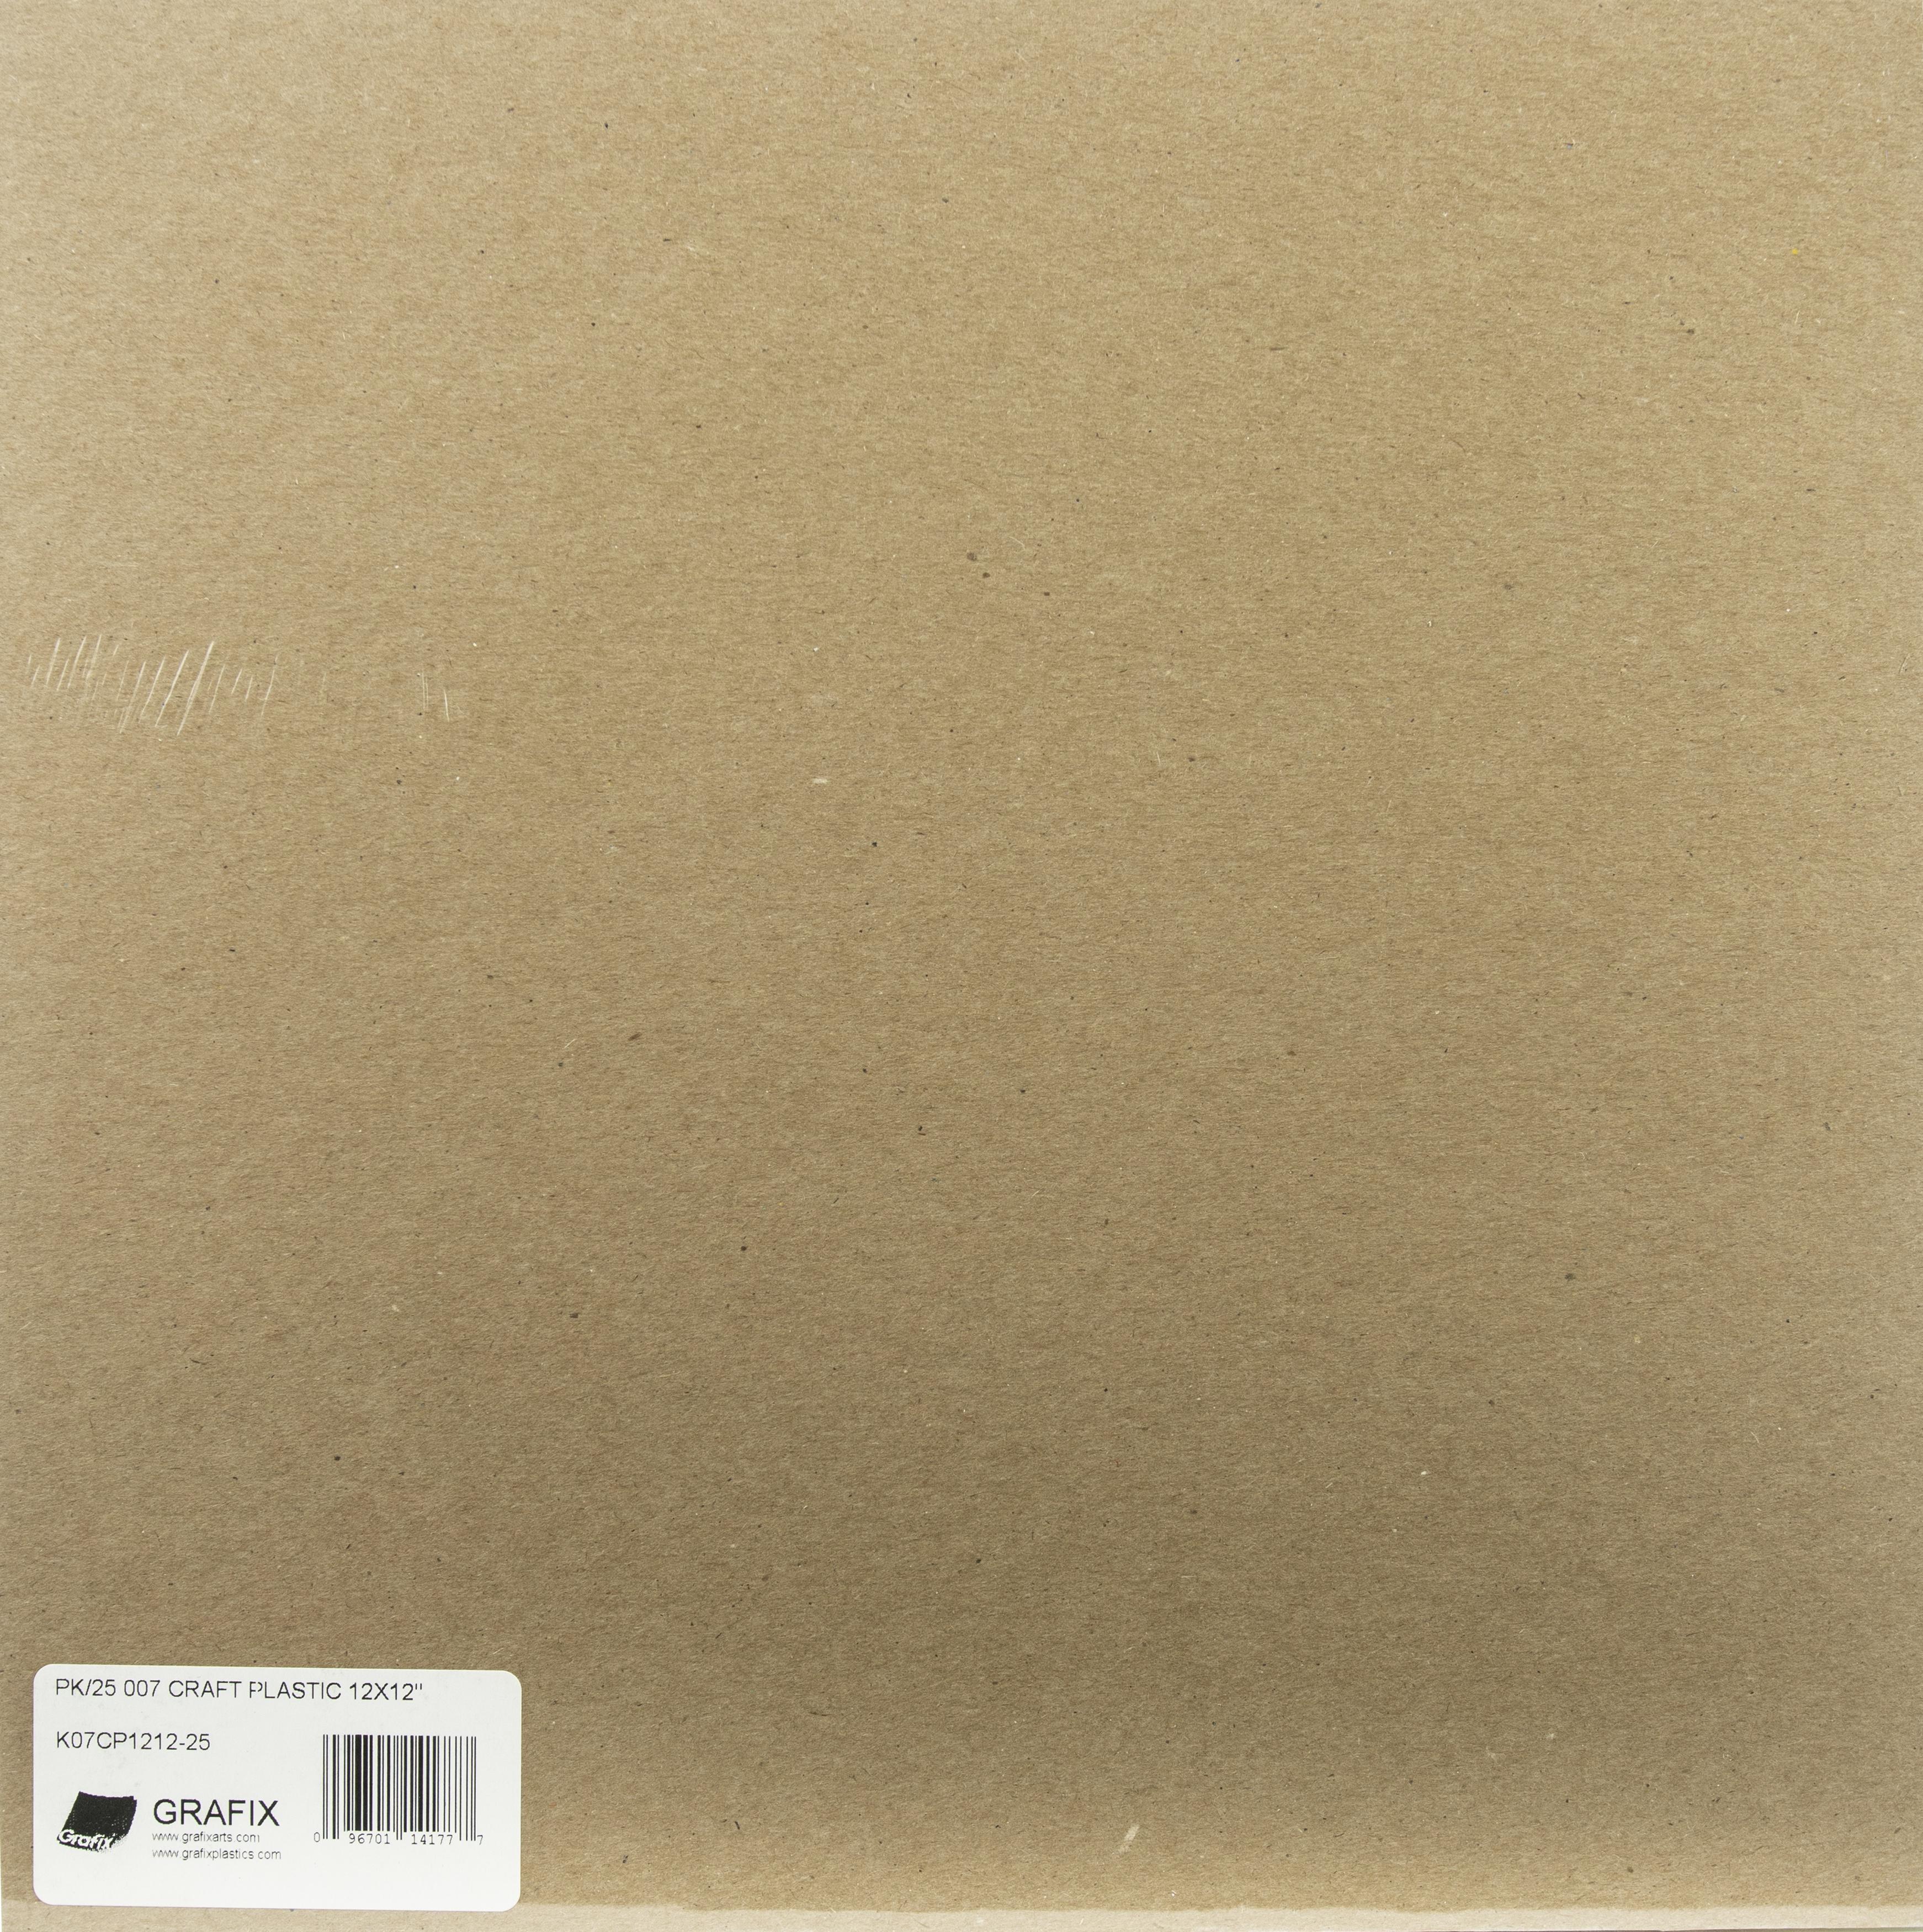 Clear Craft Plastic Sheet 12X12